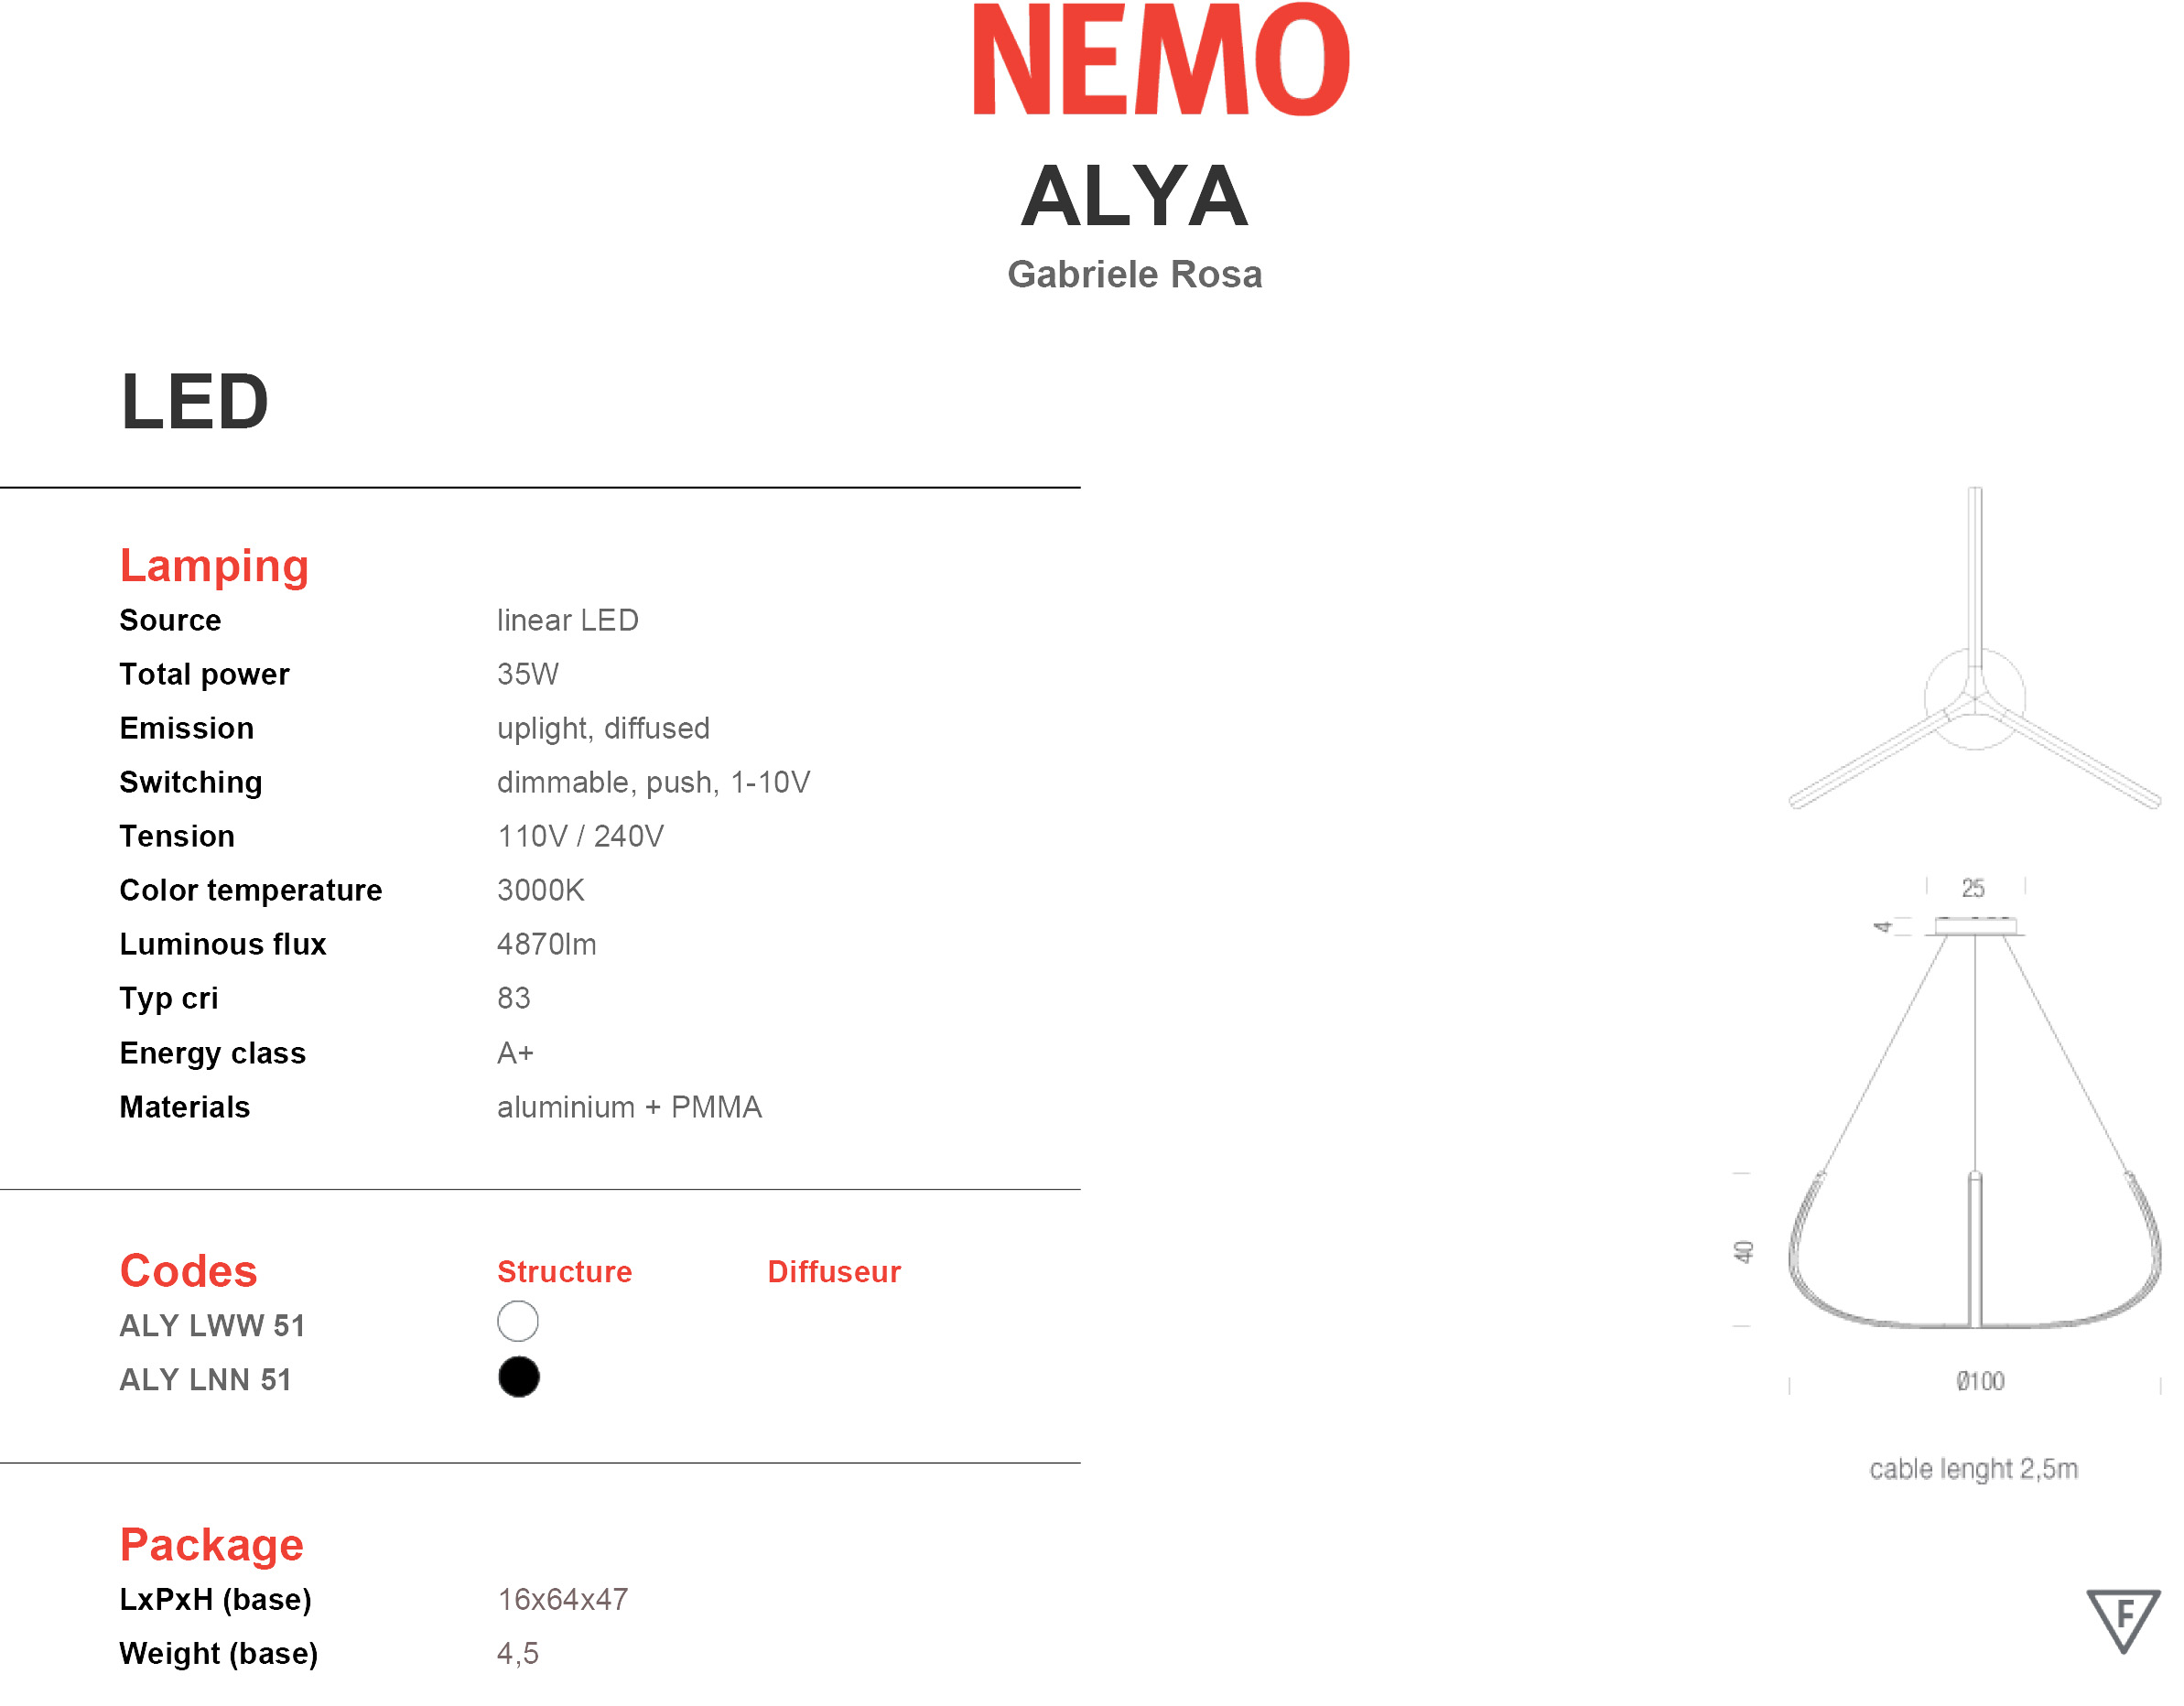 Nemo Alya Tech